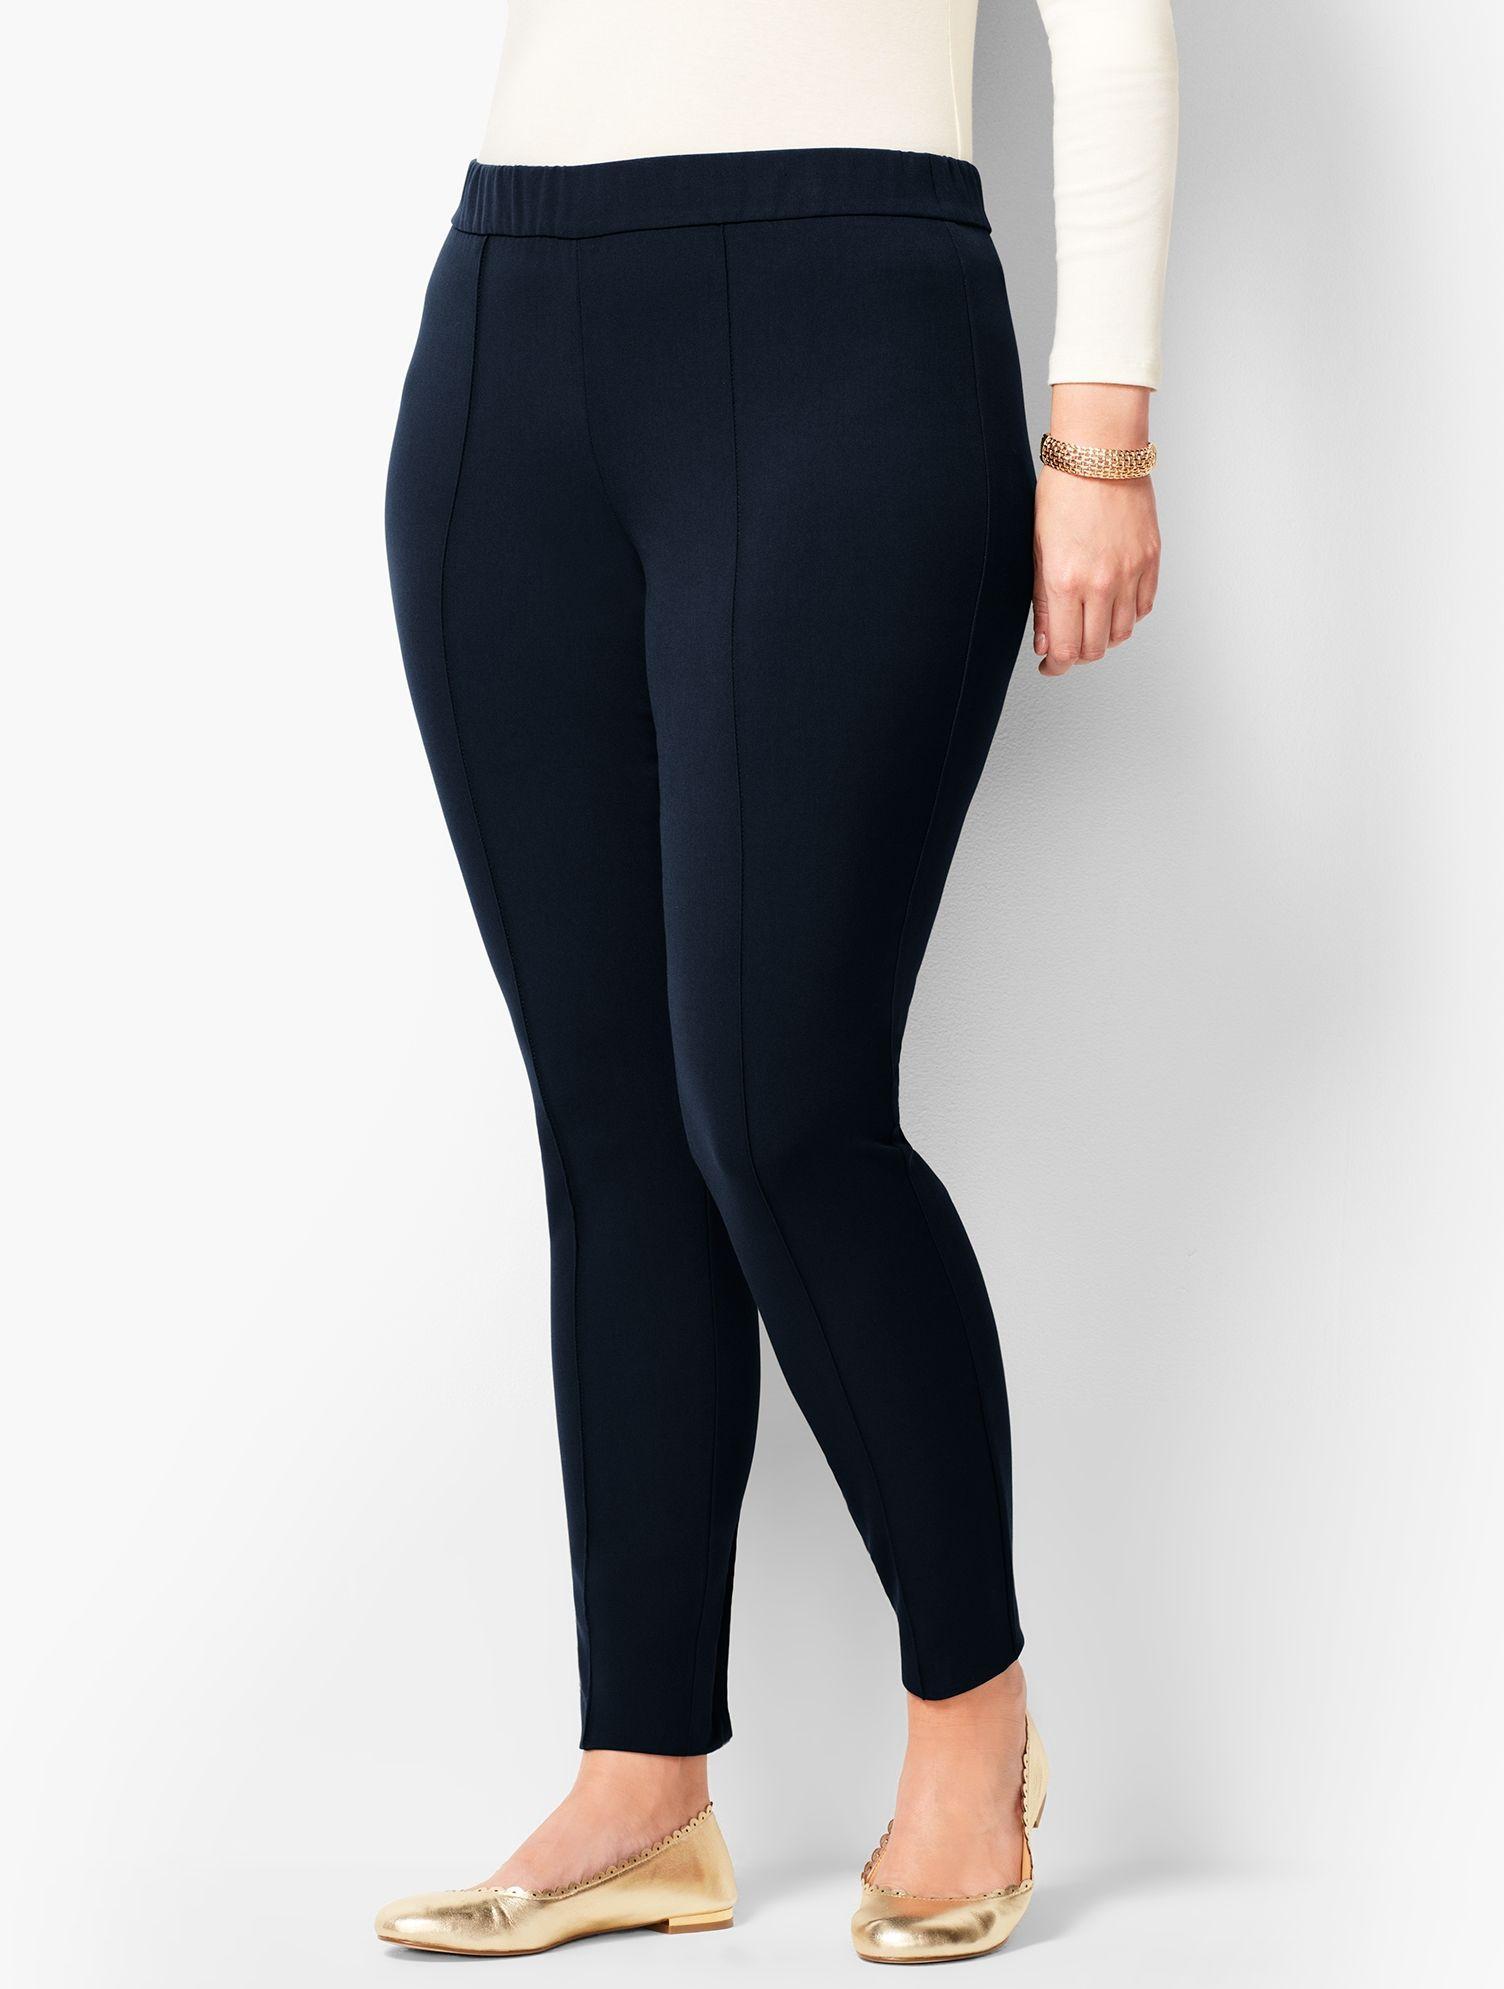 f233bec22521 Talbots. Women's Blue Plus Size High-waist Bi-stretch Skinny Ankle Pants